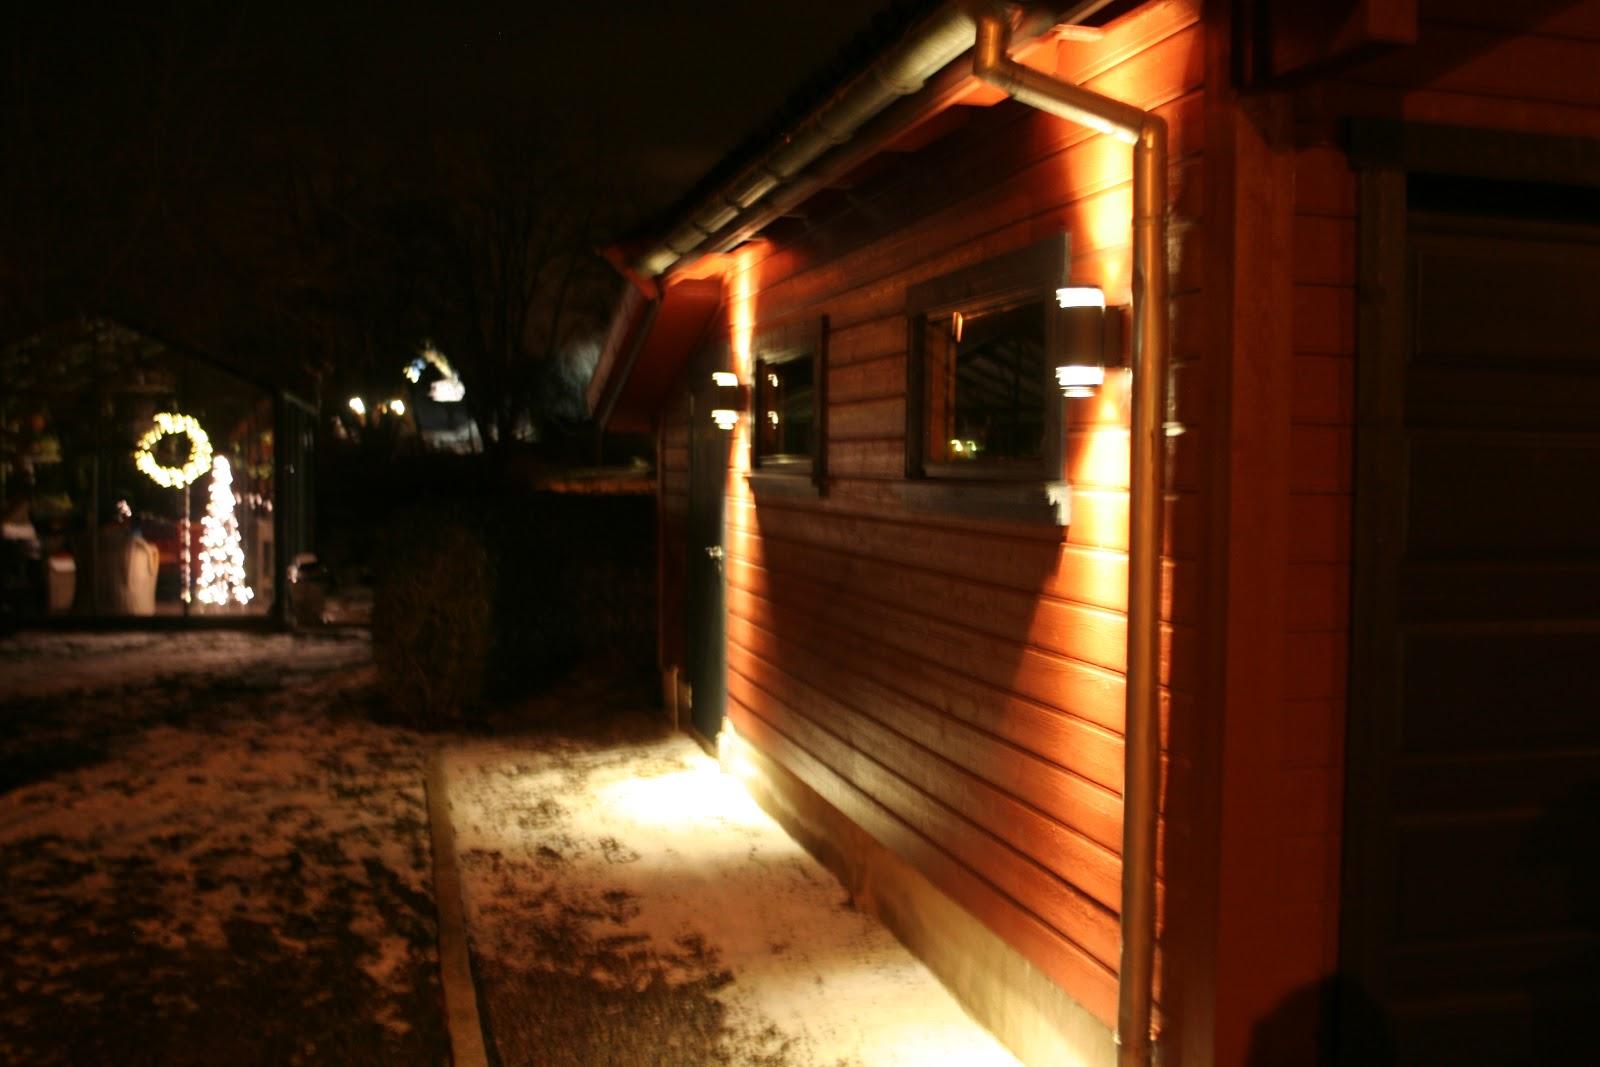 Hagegnomen Bjarnes hageblogg: Belysning ute : belysning ute : Inredning